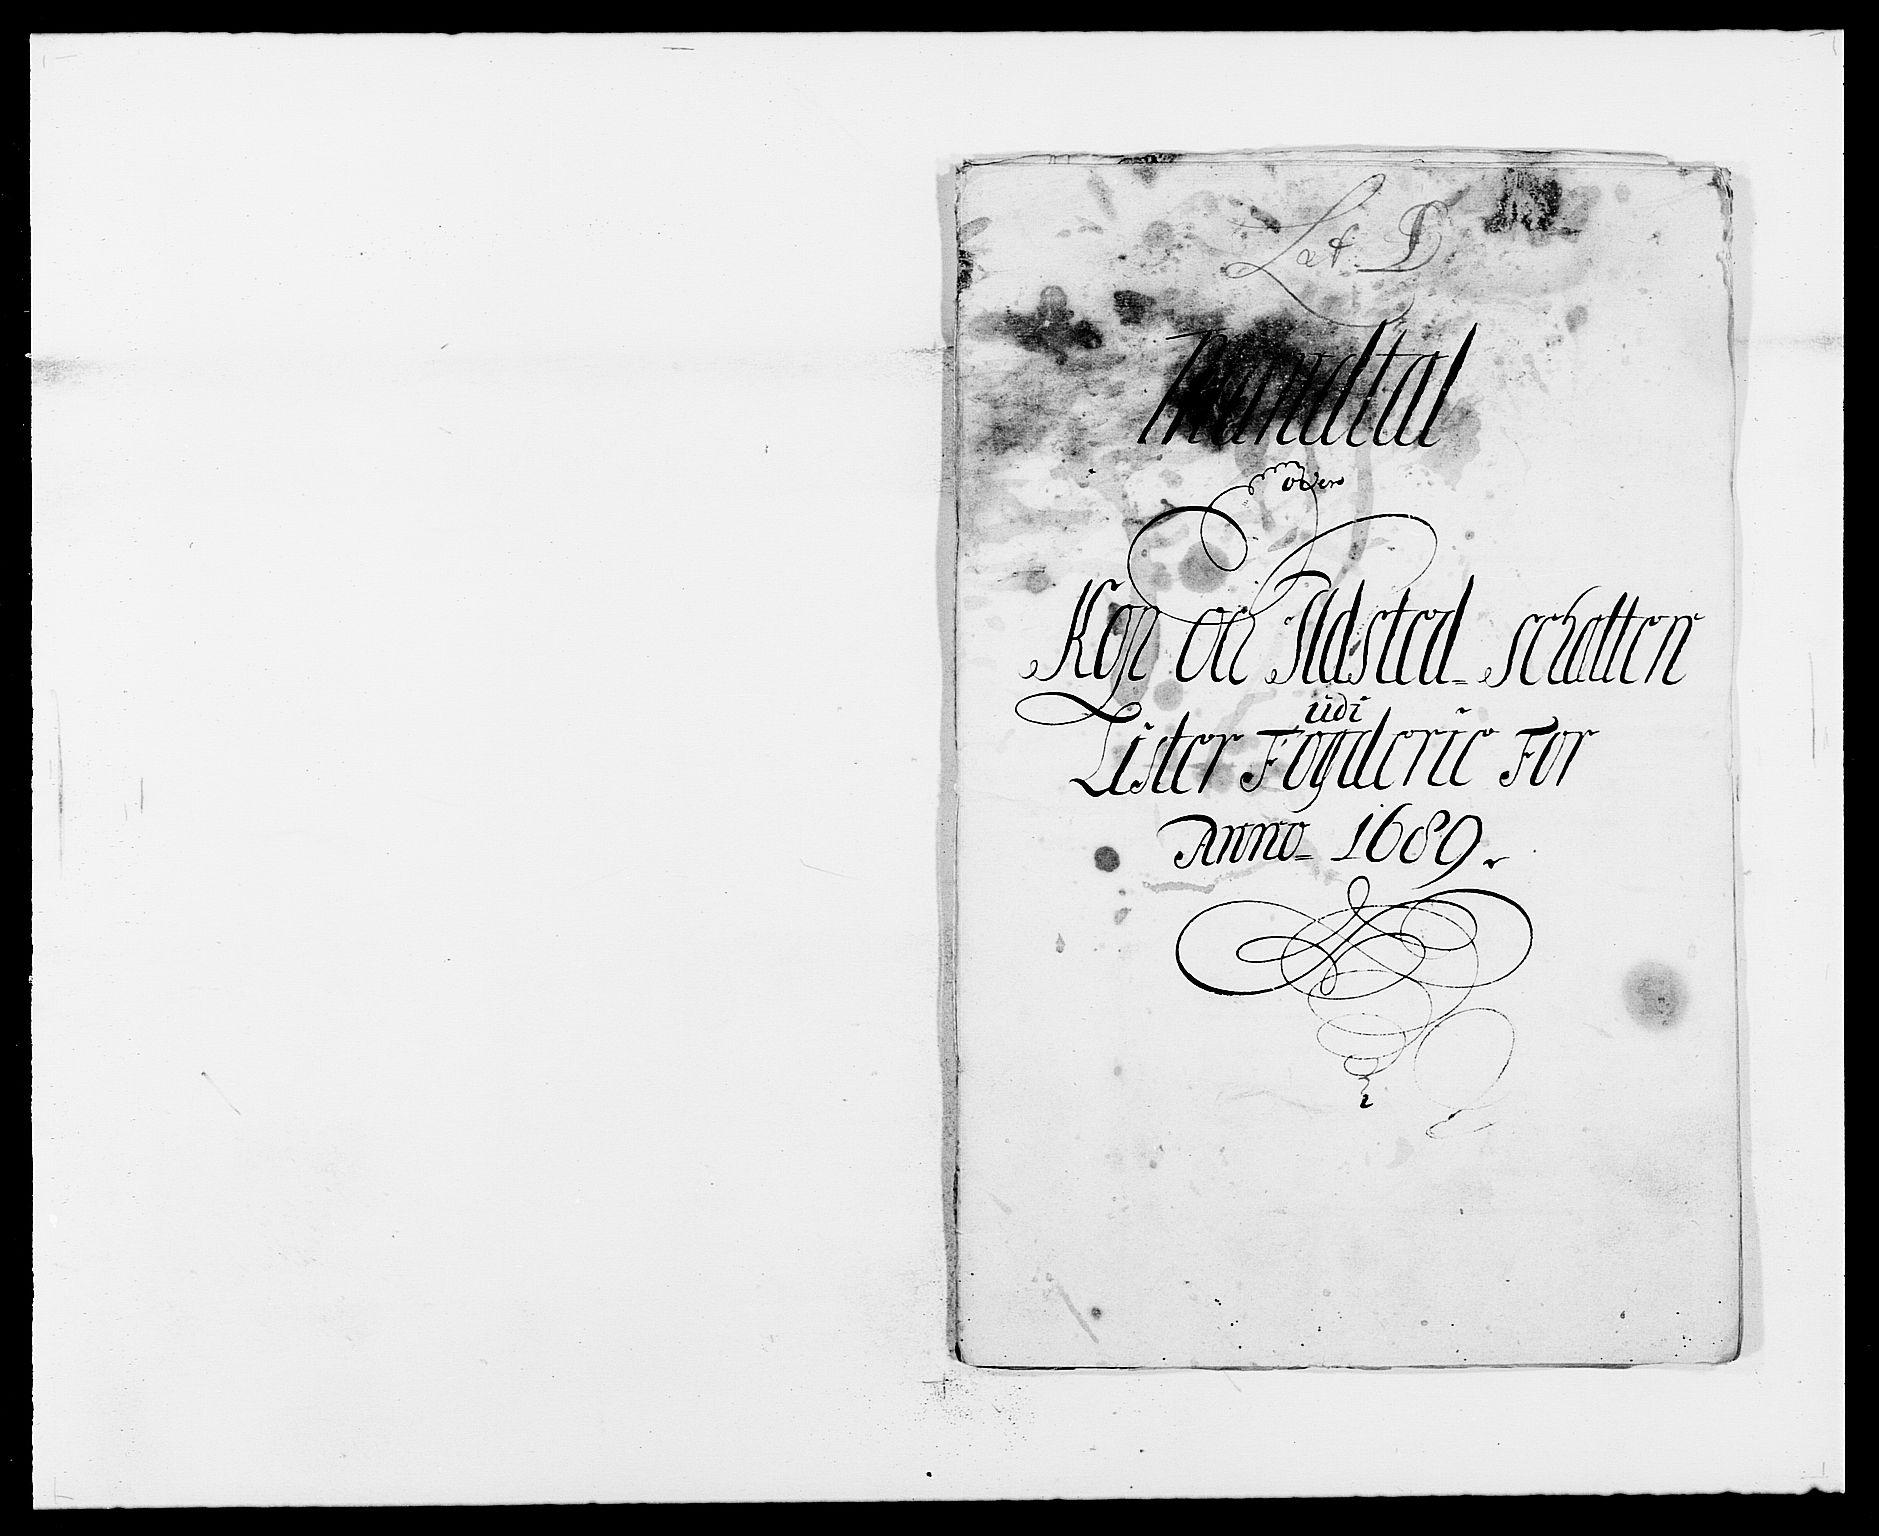 RA, Rentekammeret inntil 1814, Reviderte regnskaper, Fogderegnskap, R41/L2535: Fogderegnskap Lista, 1686-1689, s. 21